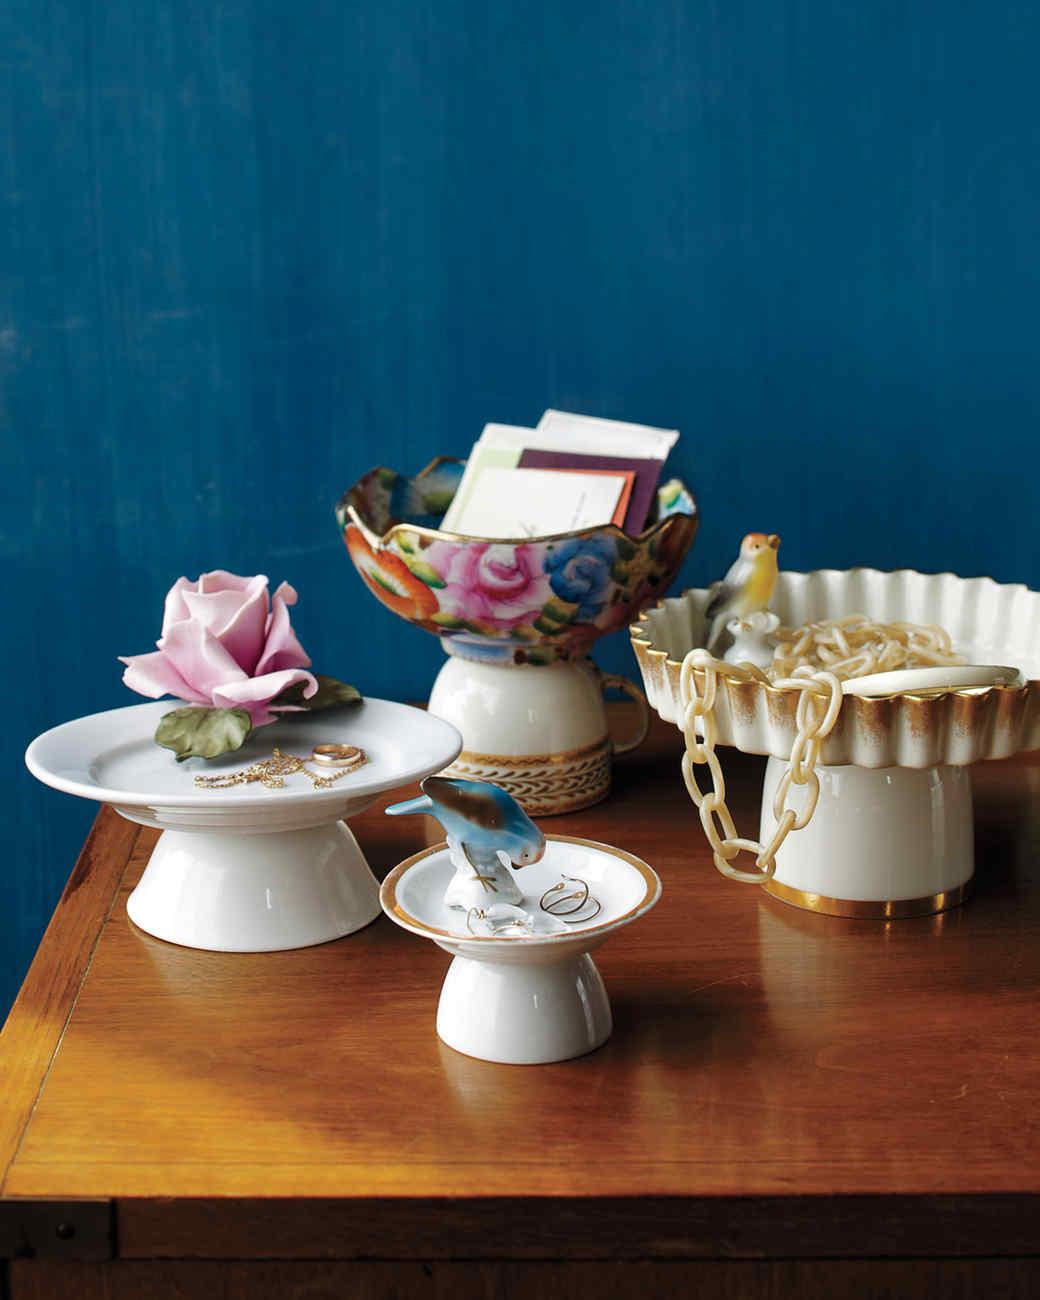 cakestands-dresser-mld108936.jpg